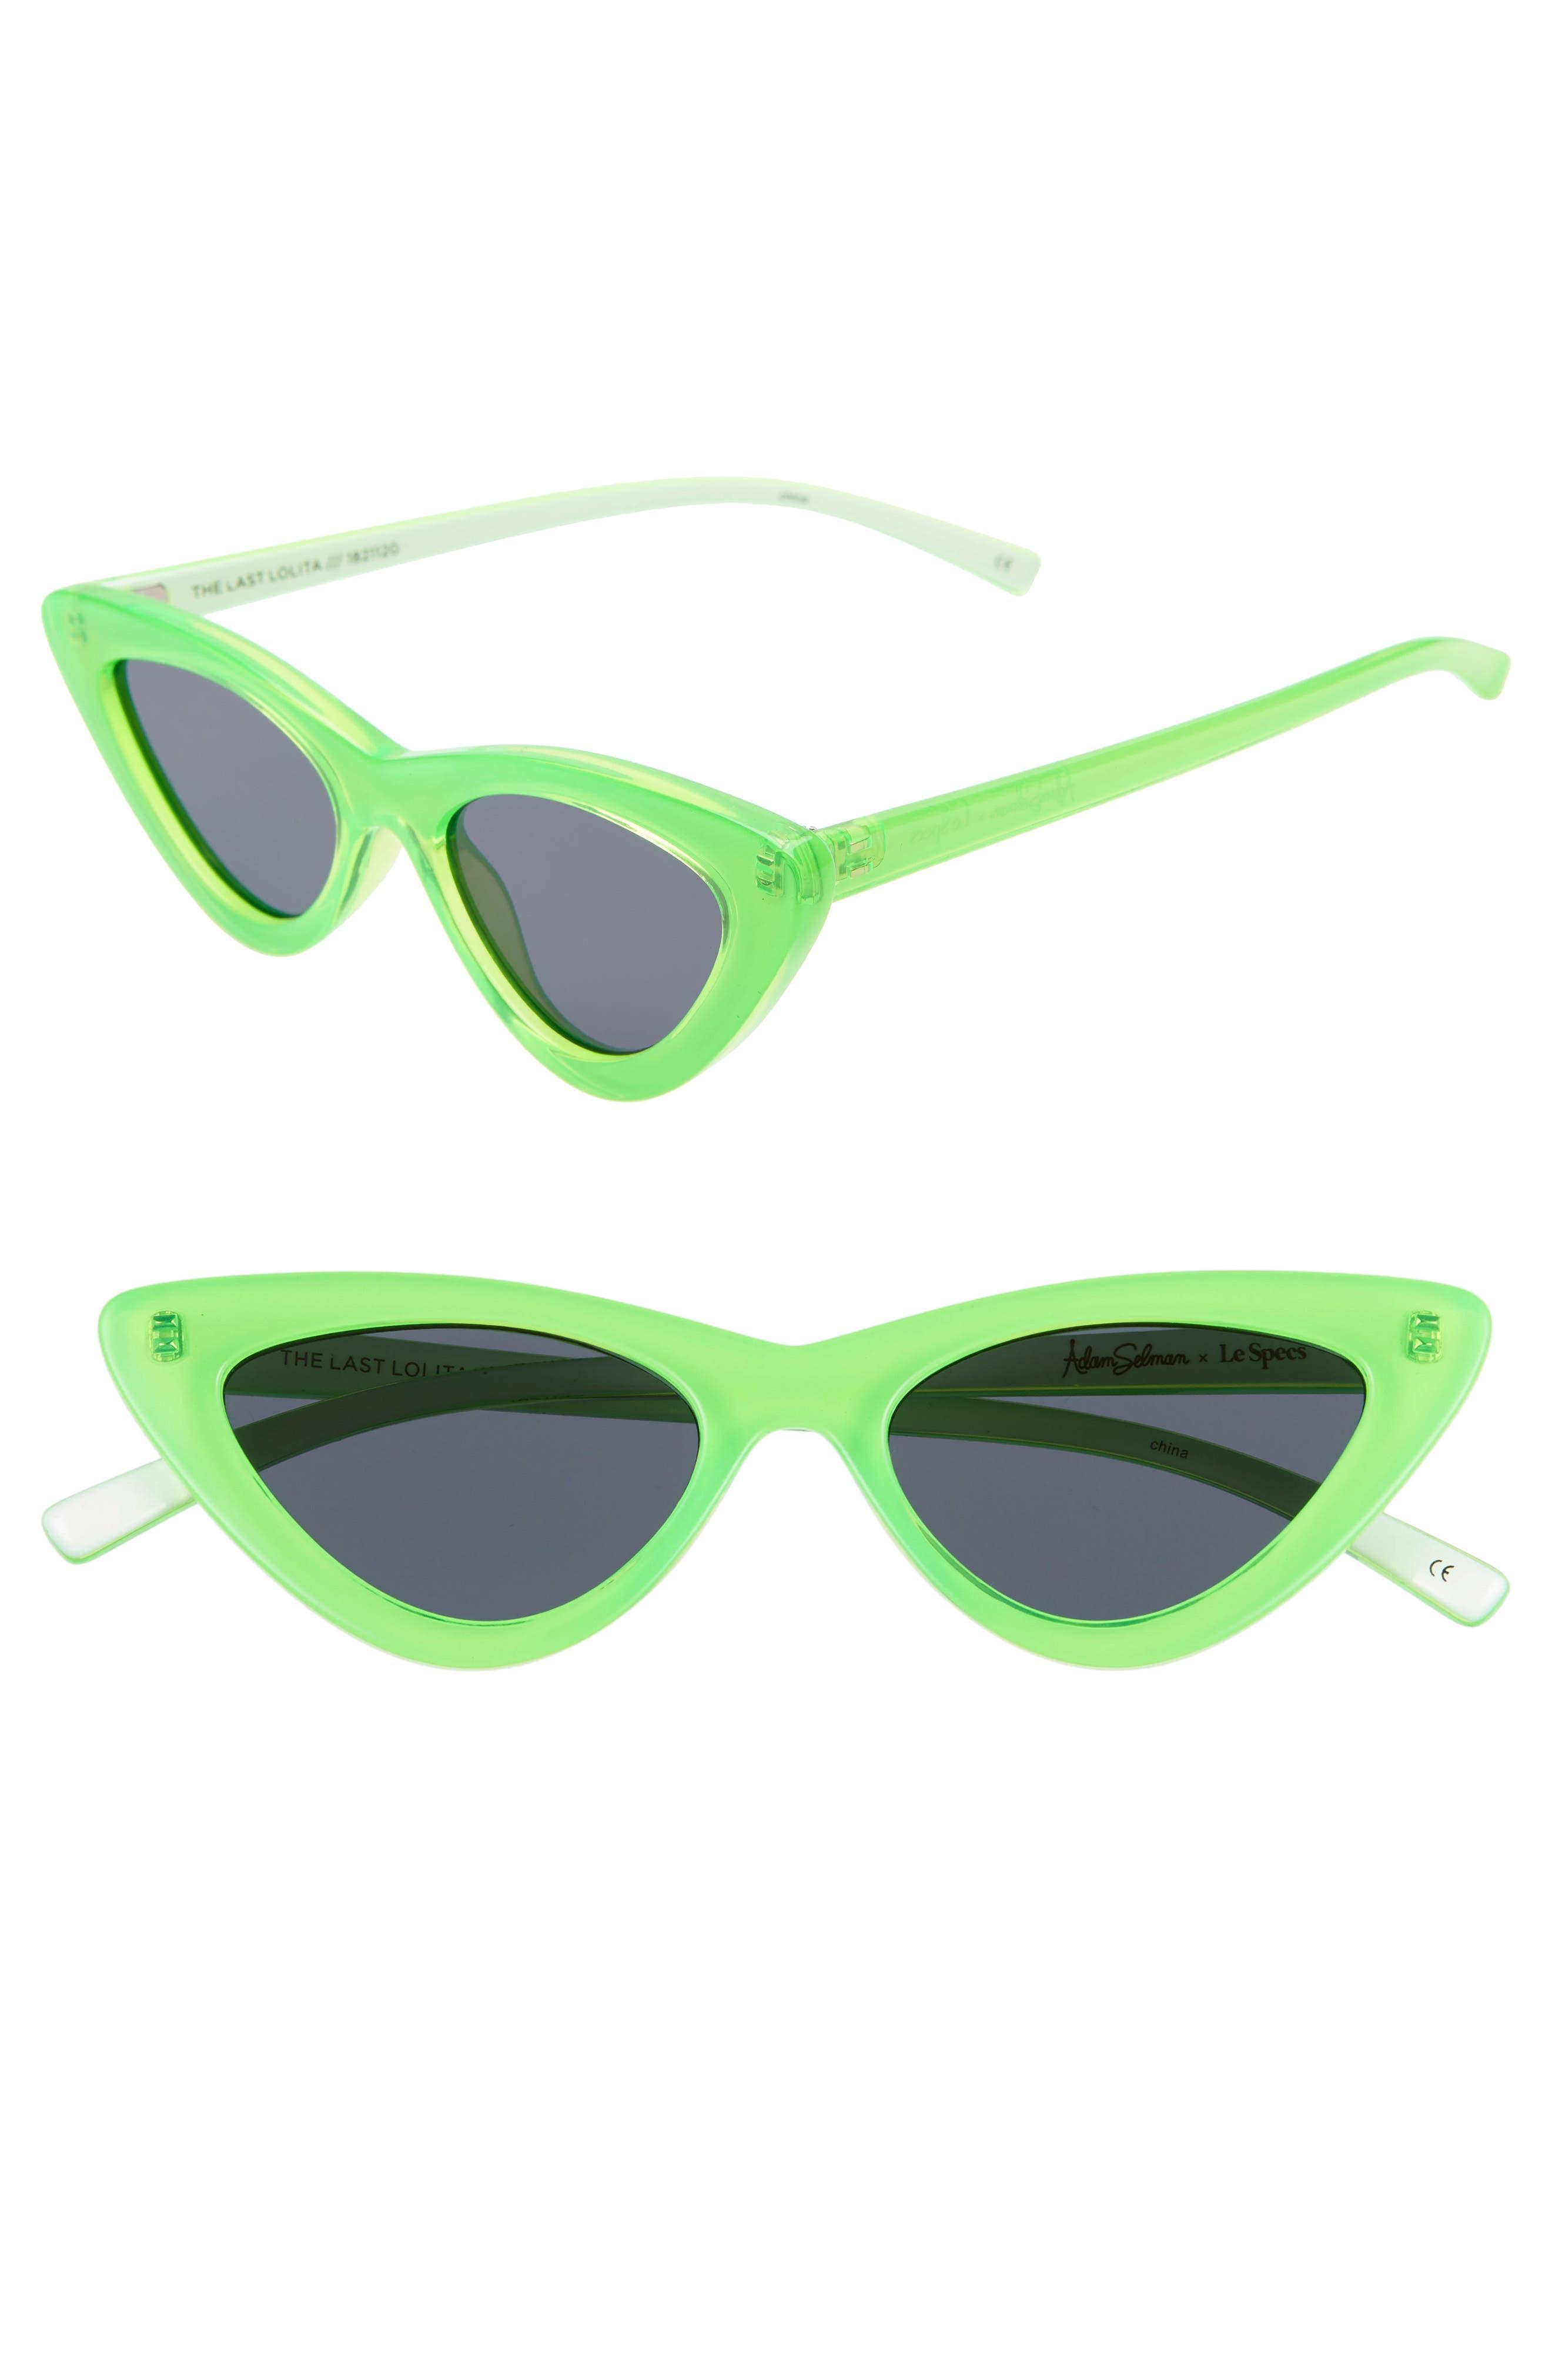 Adam Selman X Le Specs Luxe Lolita 4m Cat Eye Sunglasses - Neon Lime